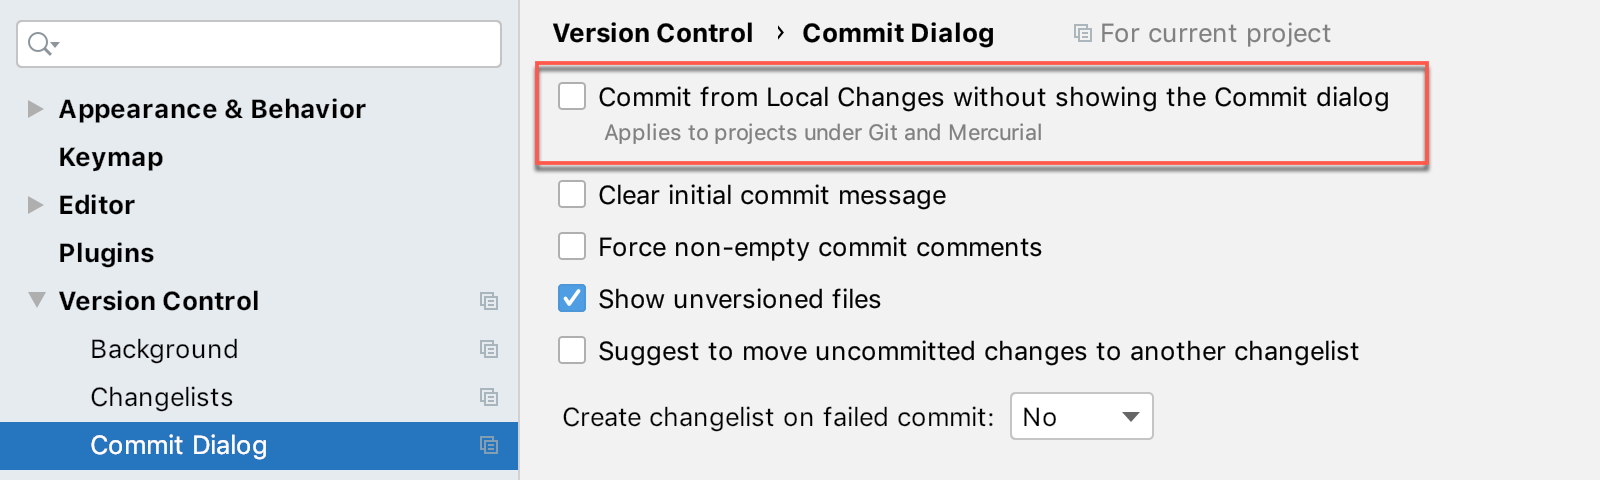 commit_dialog